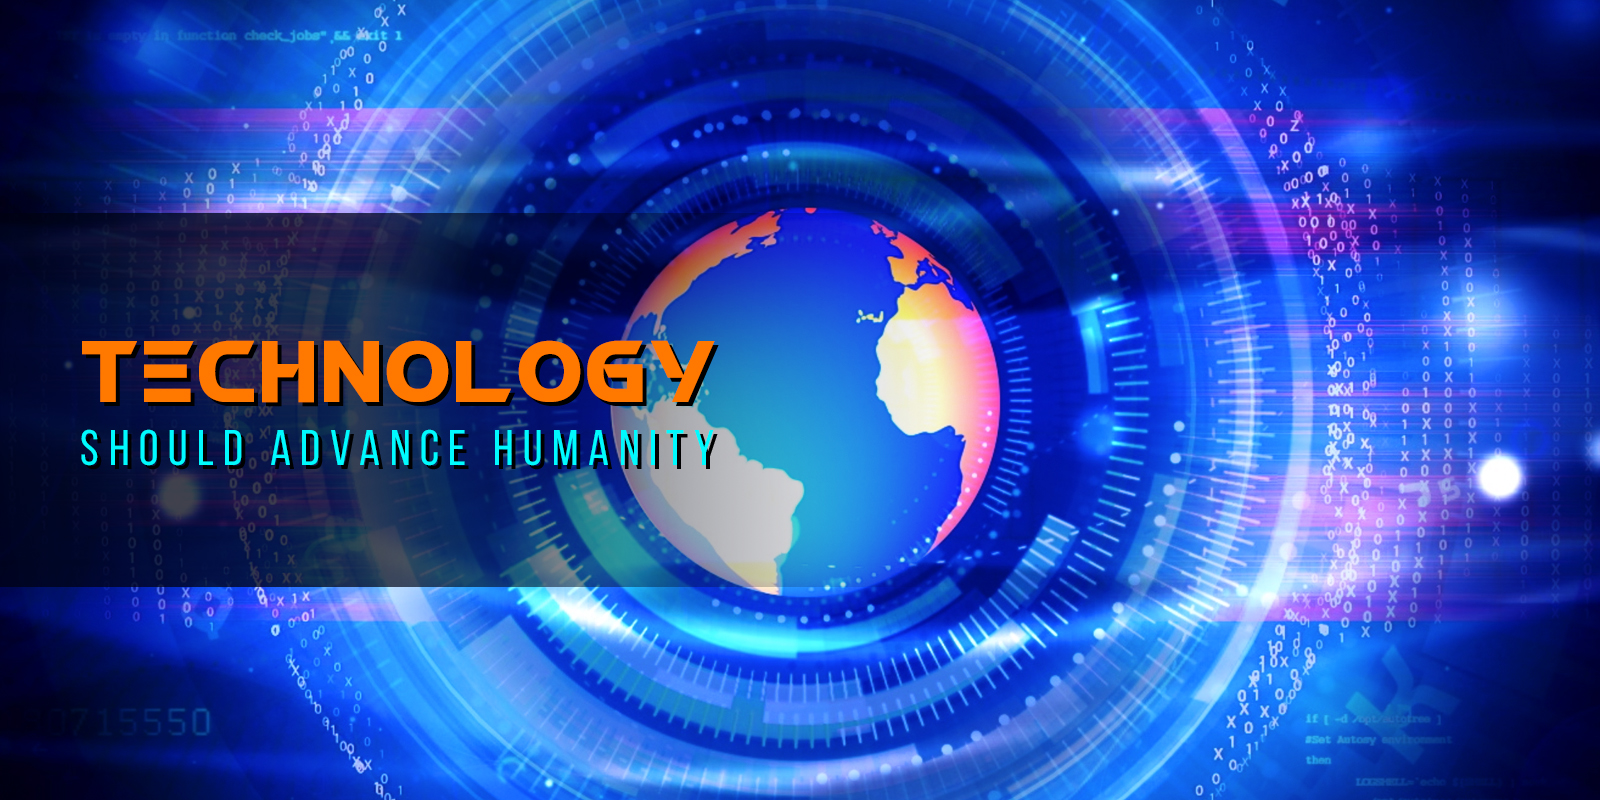 Technology Should Advance Humanity